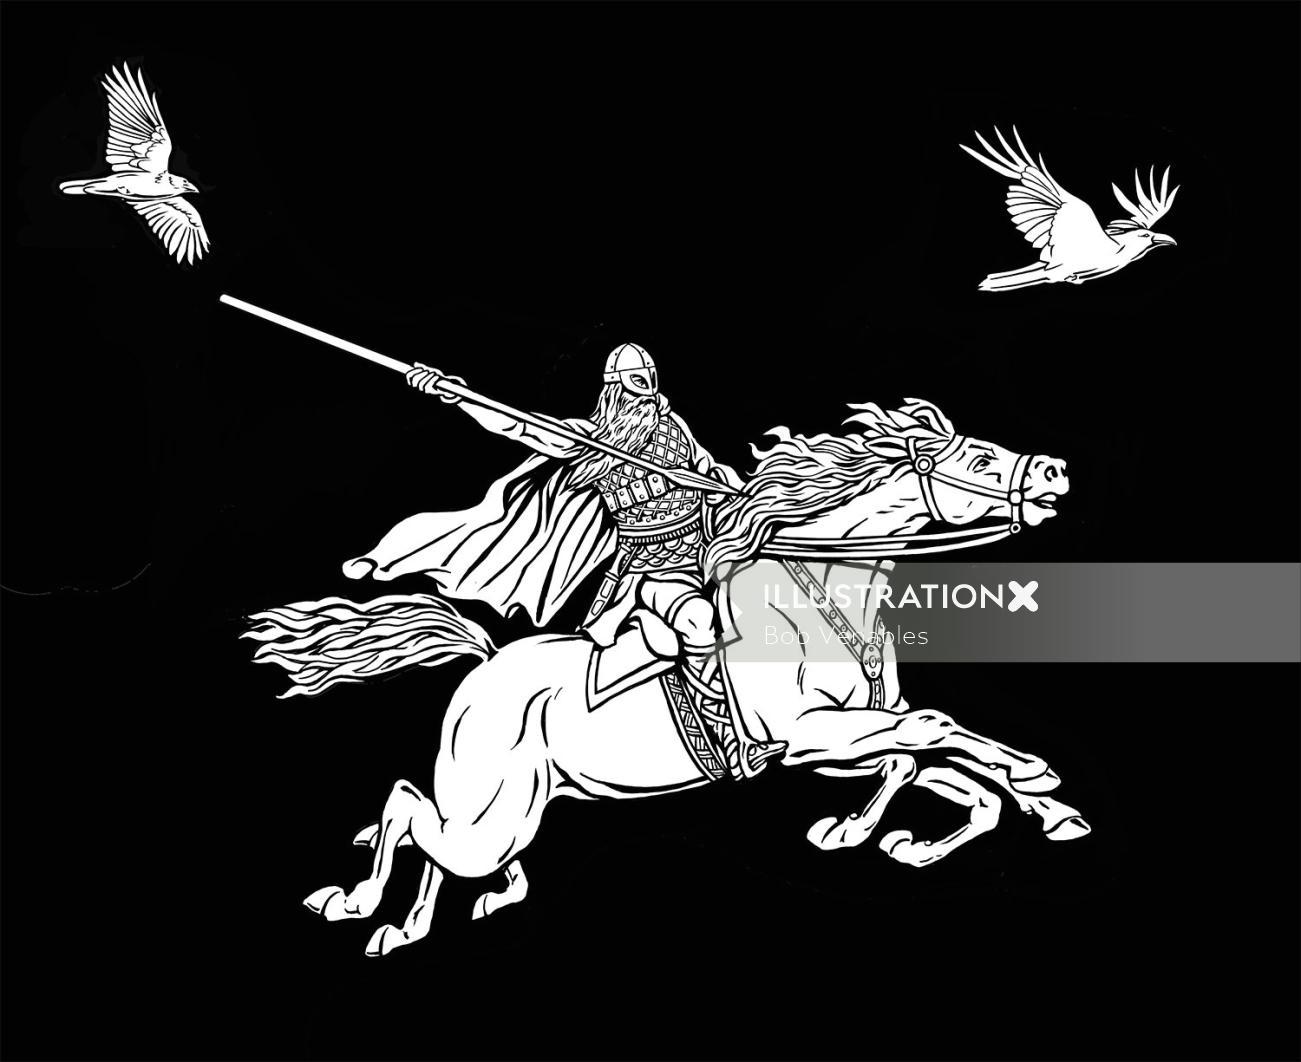 Horse warrior black and white illustration